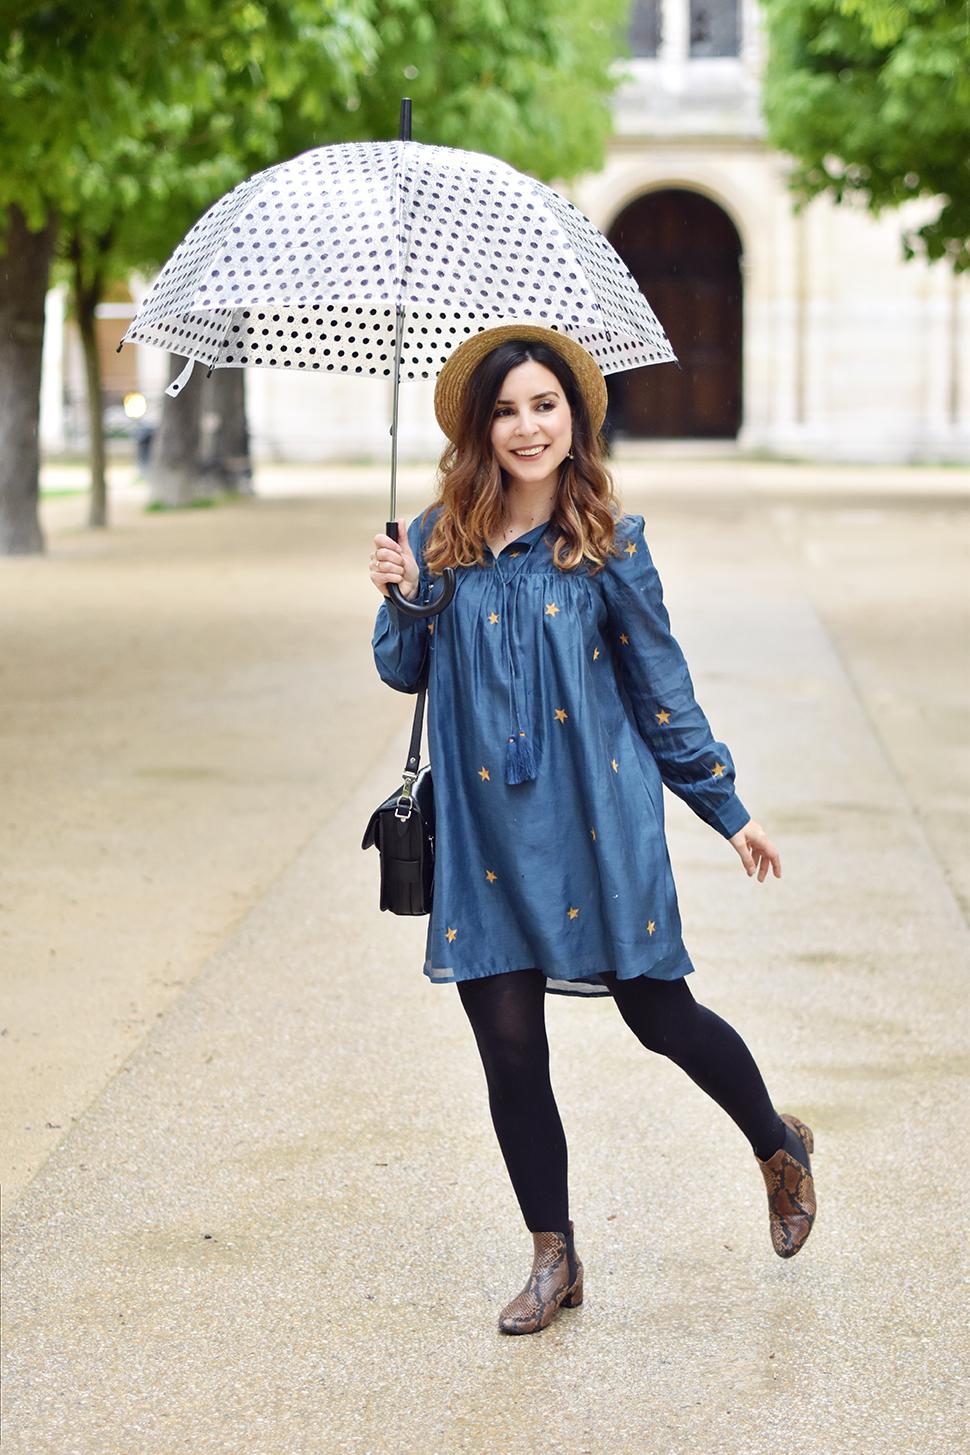 Helloitsvalentine_umbrella_6